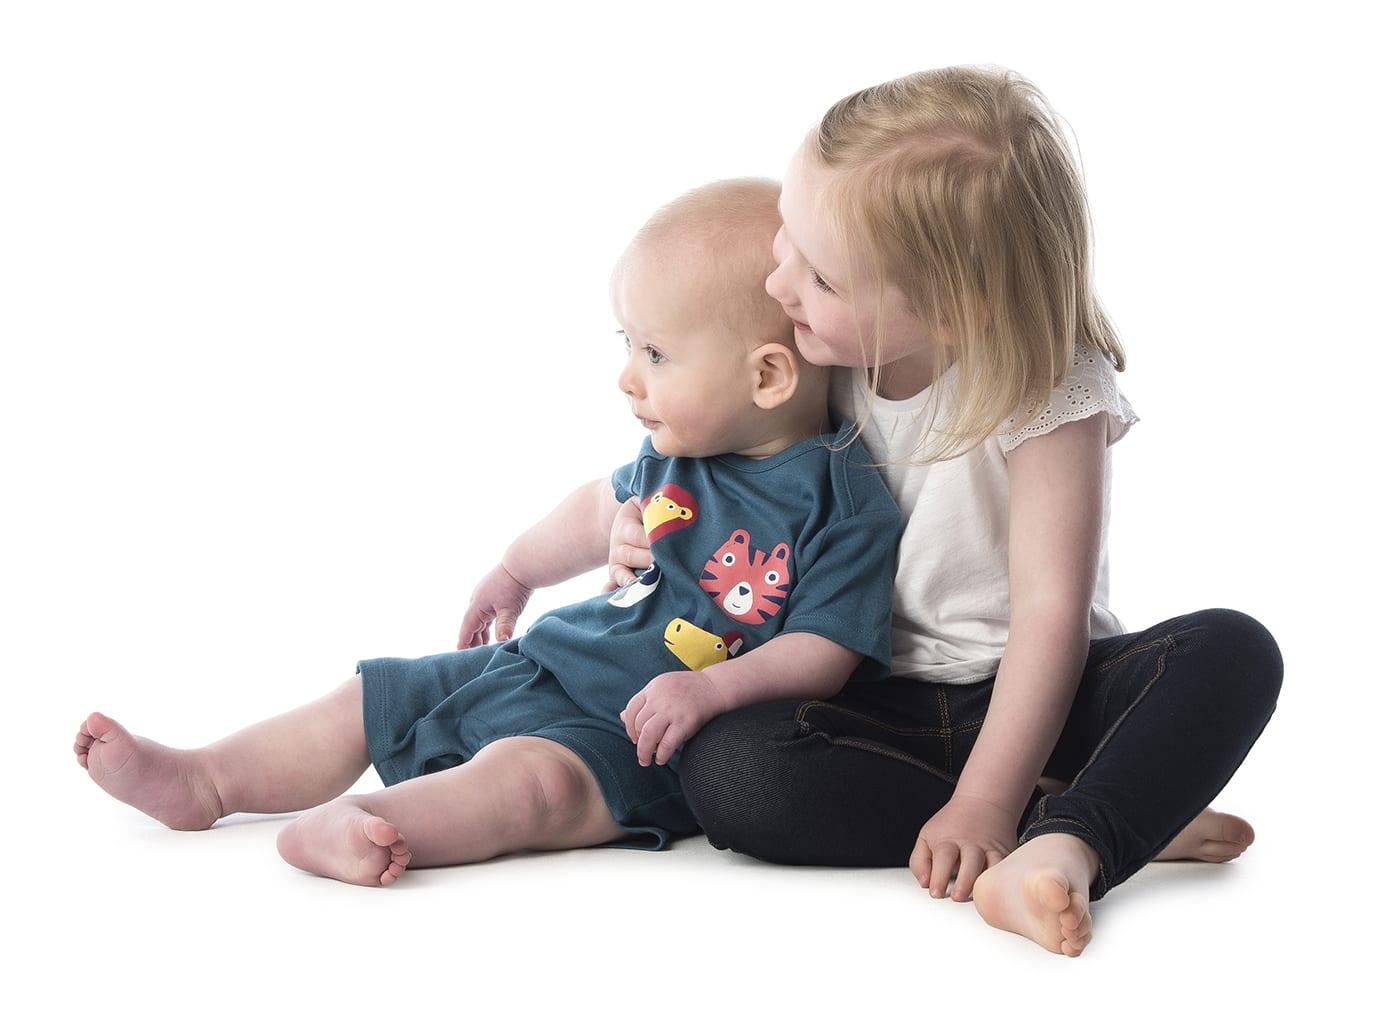 children-photos-twofrontteeth05